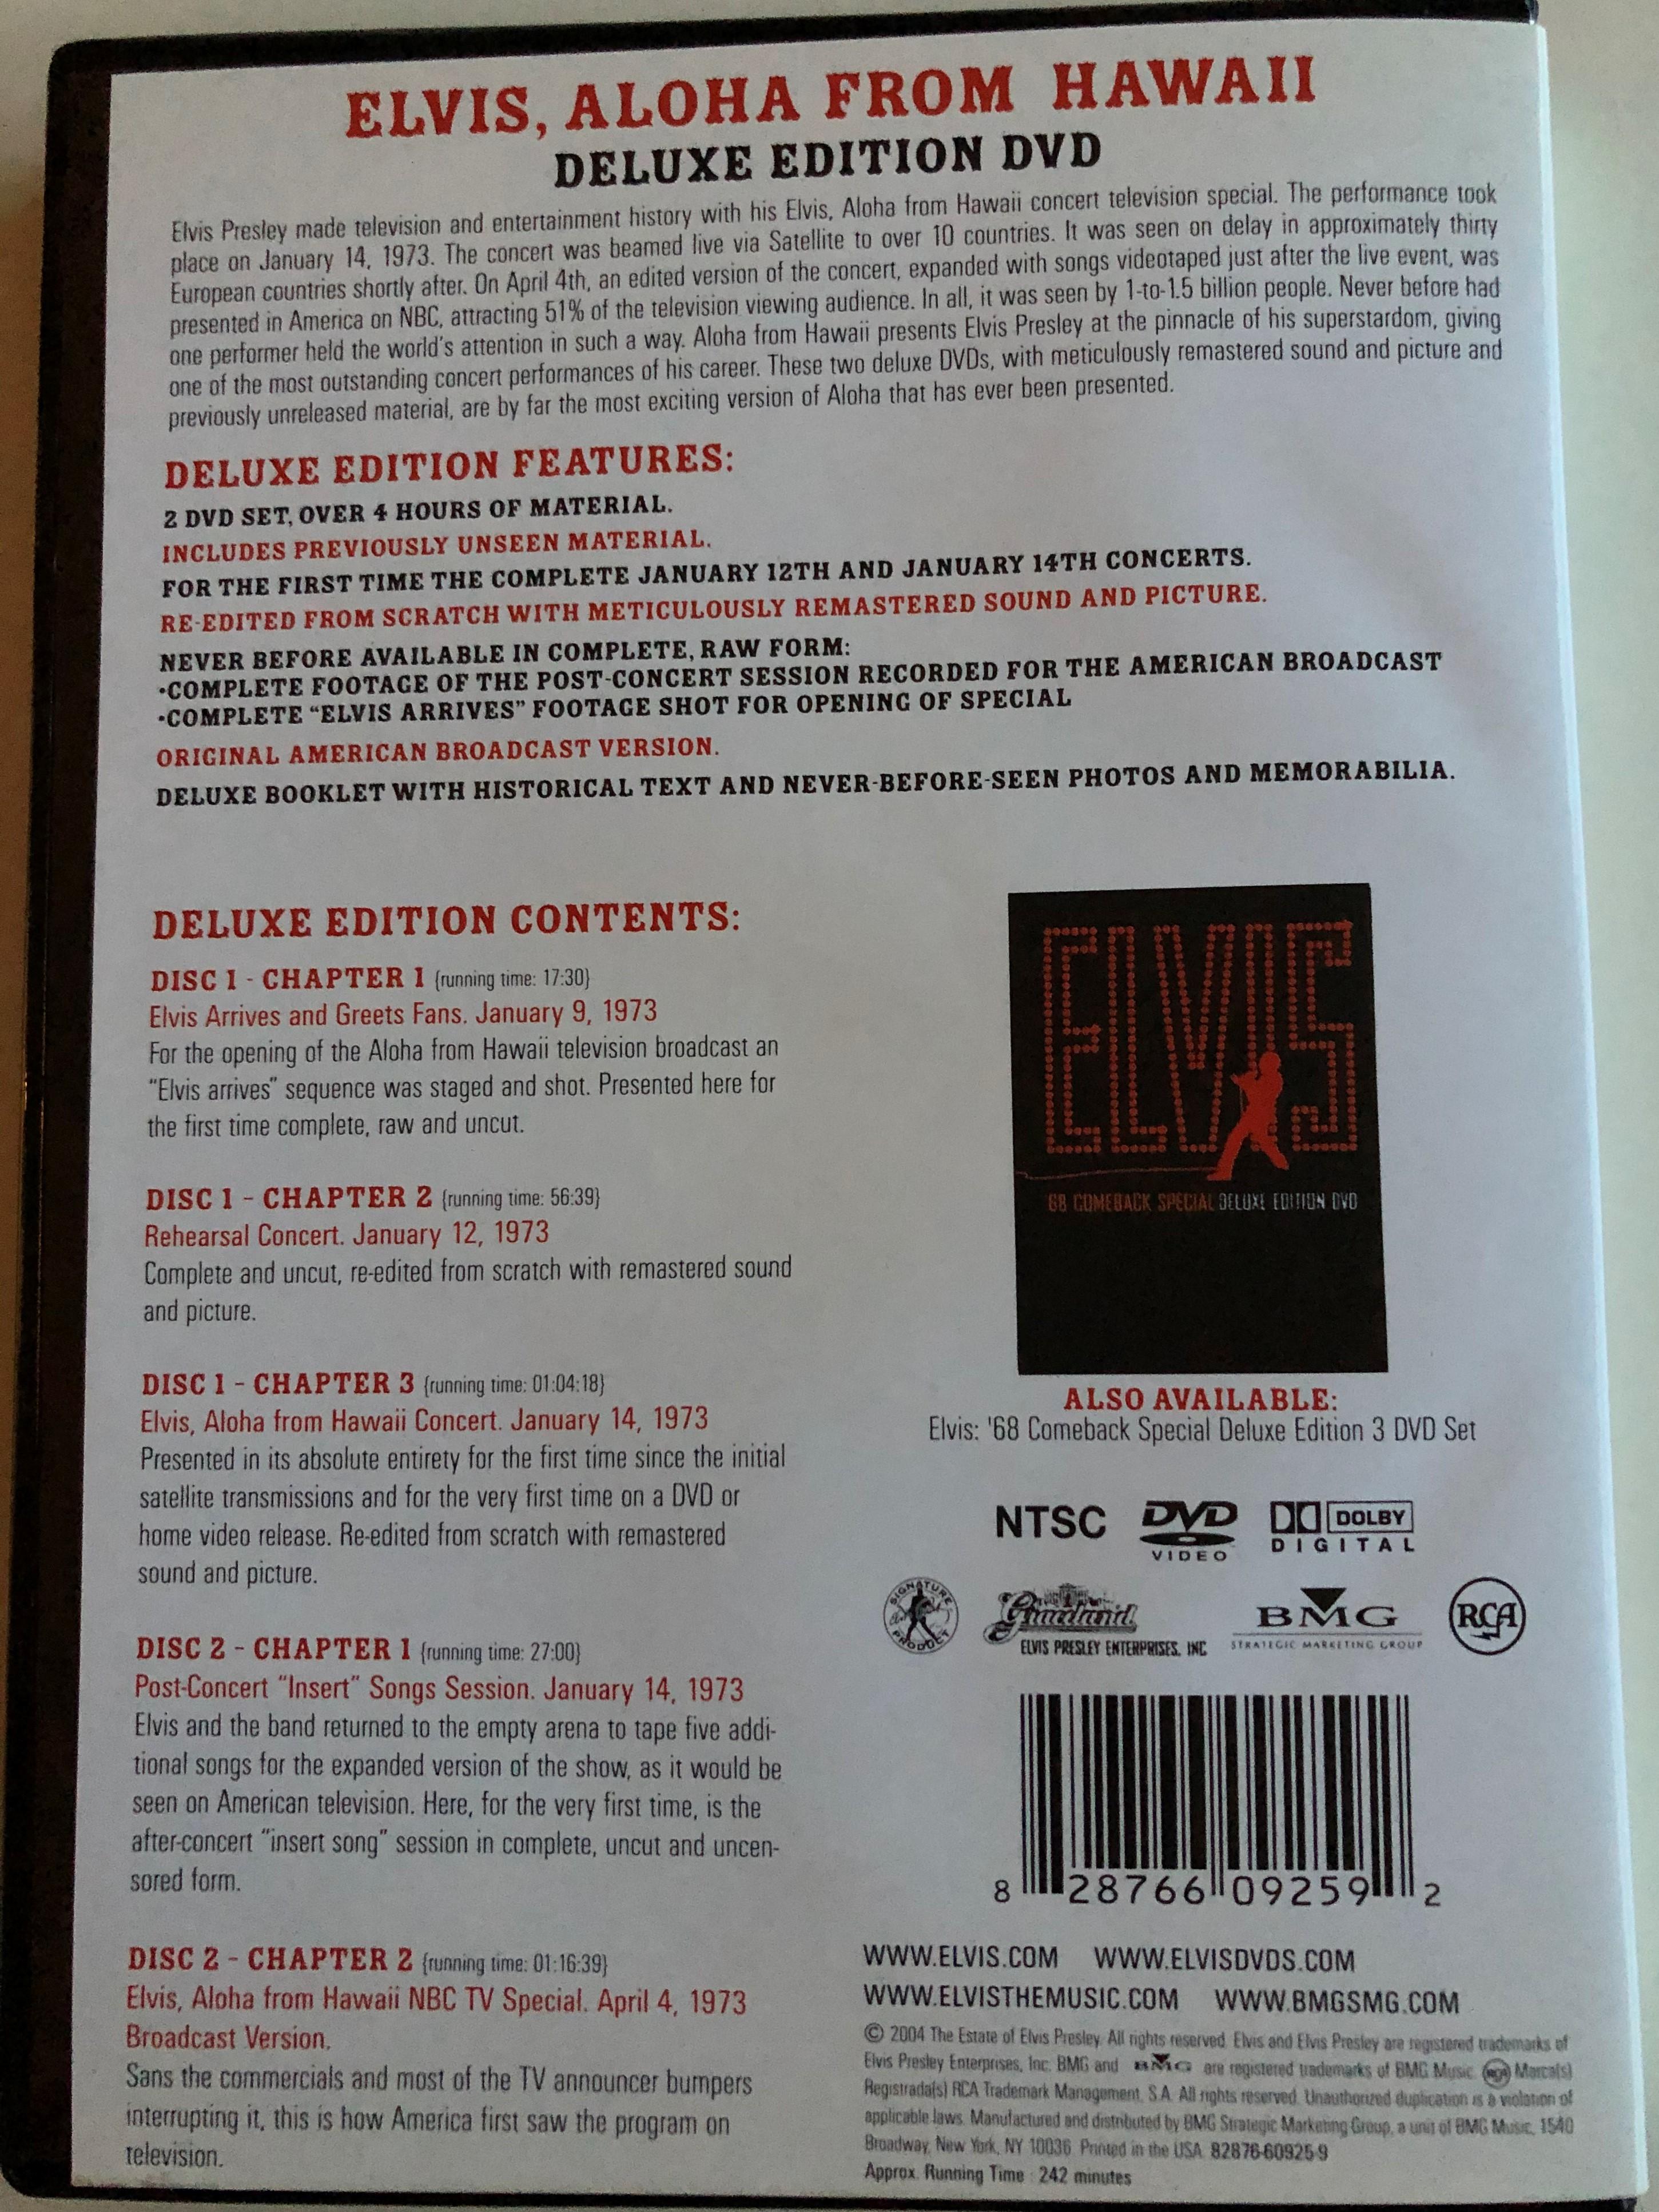 elvis-aloha-from-hawaii-deluxe-edition-dvd-2004-2x-dvd-set-3.jpg